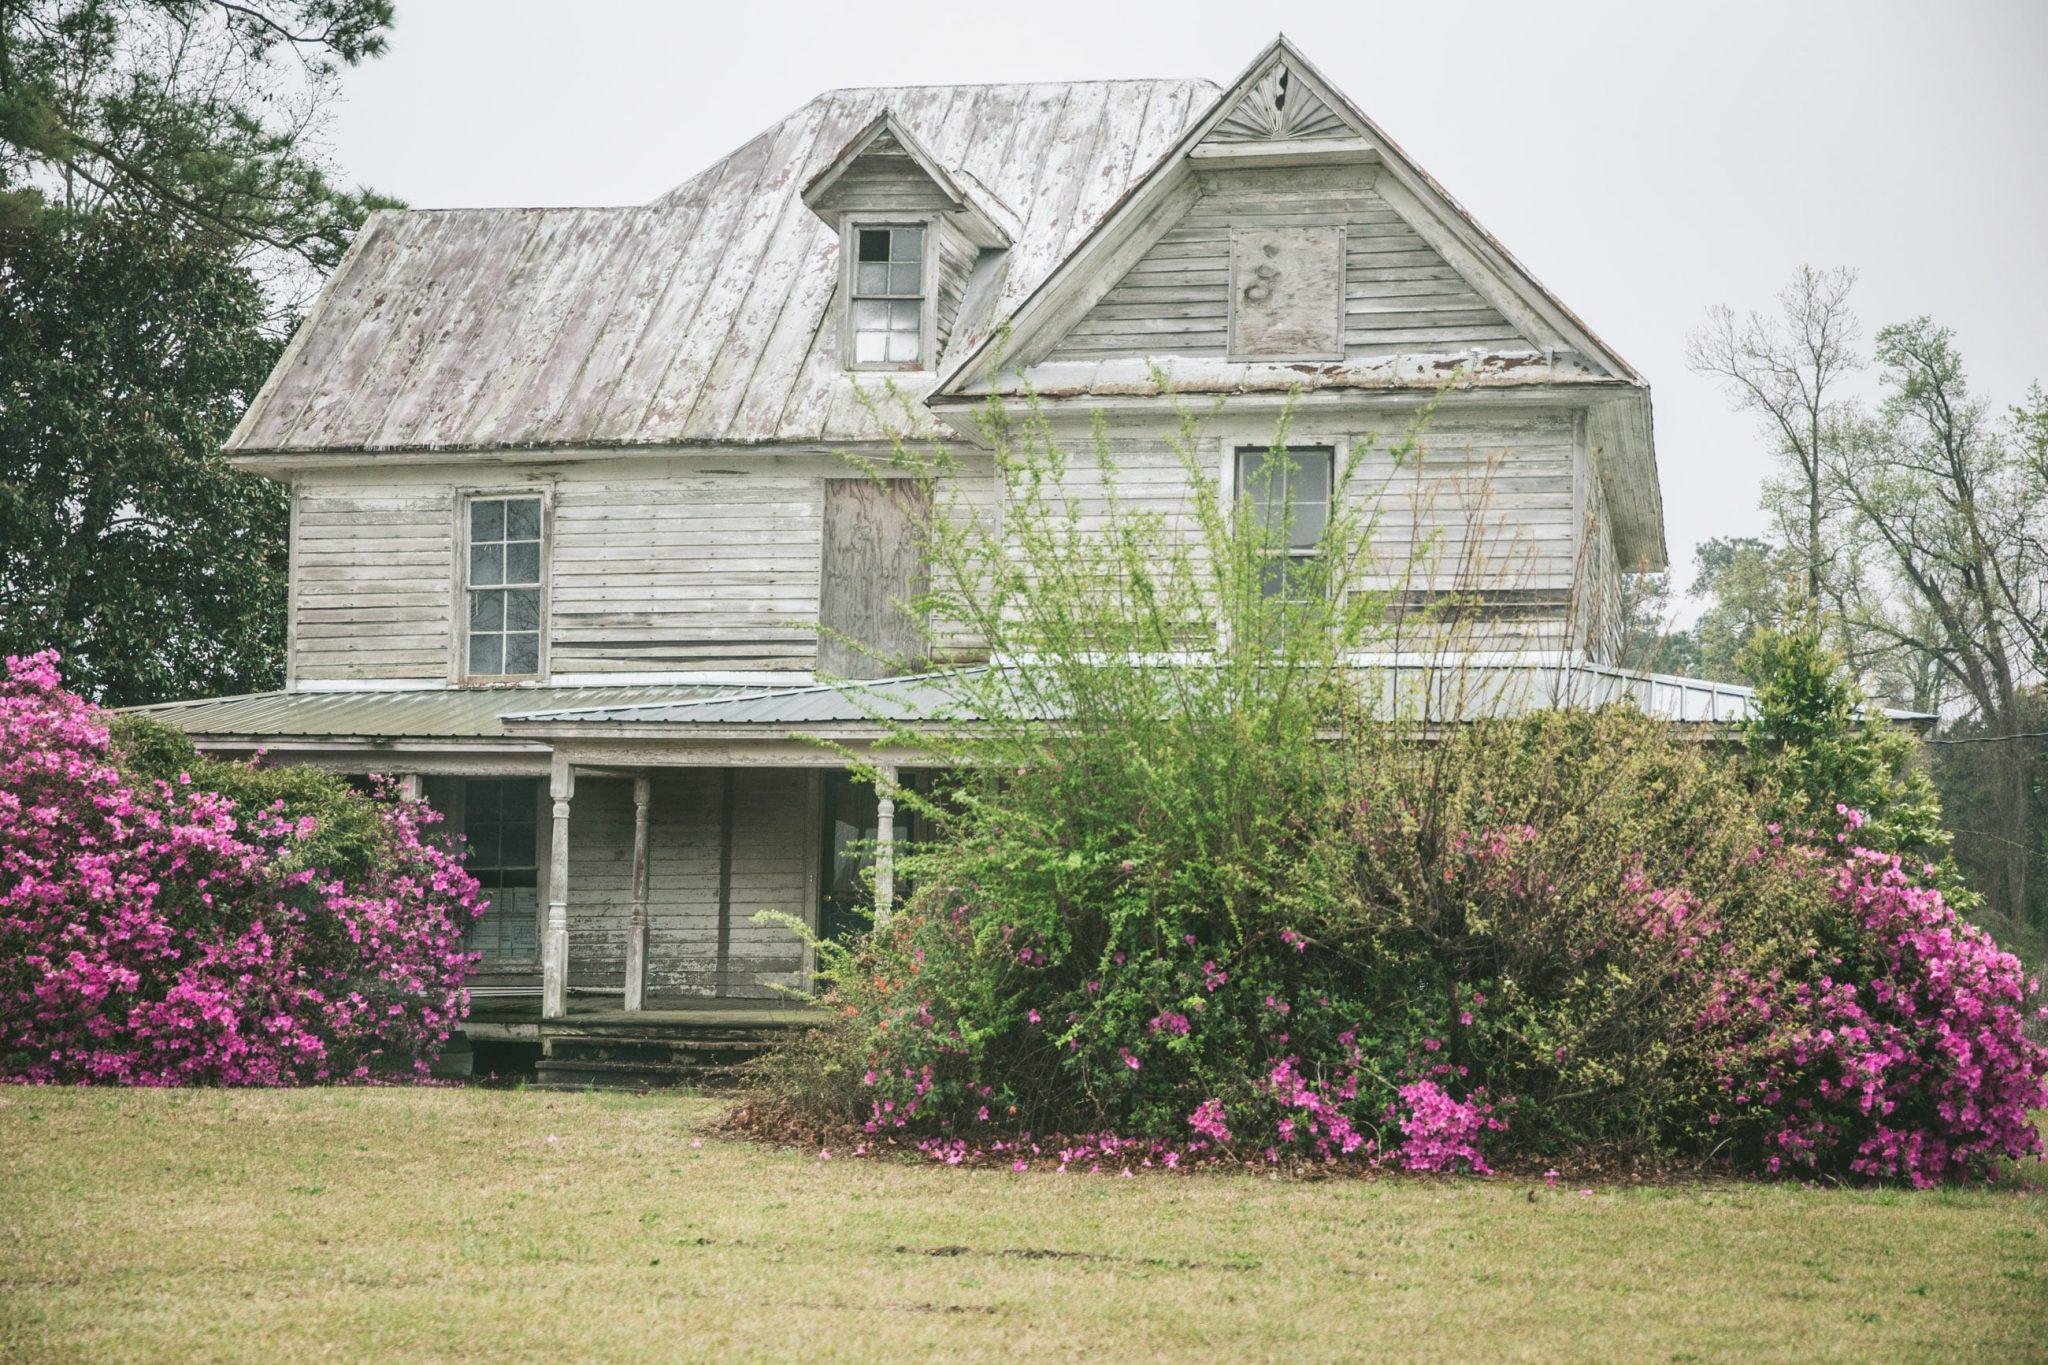 Abandoned farmhouse with beautiful azaleas